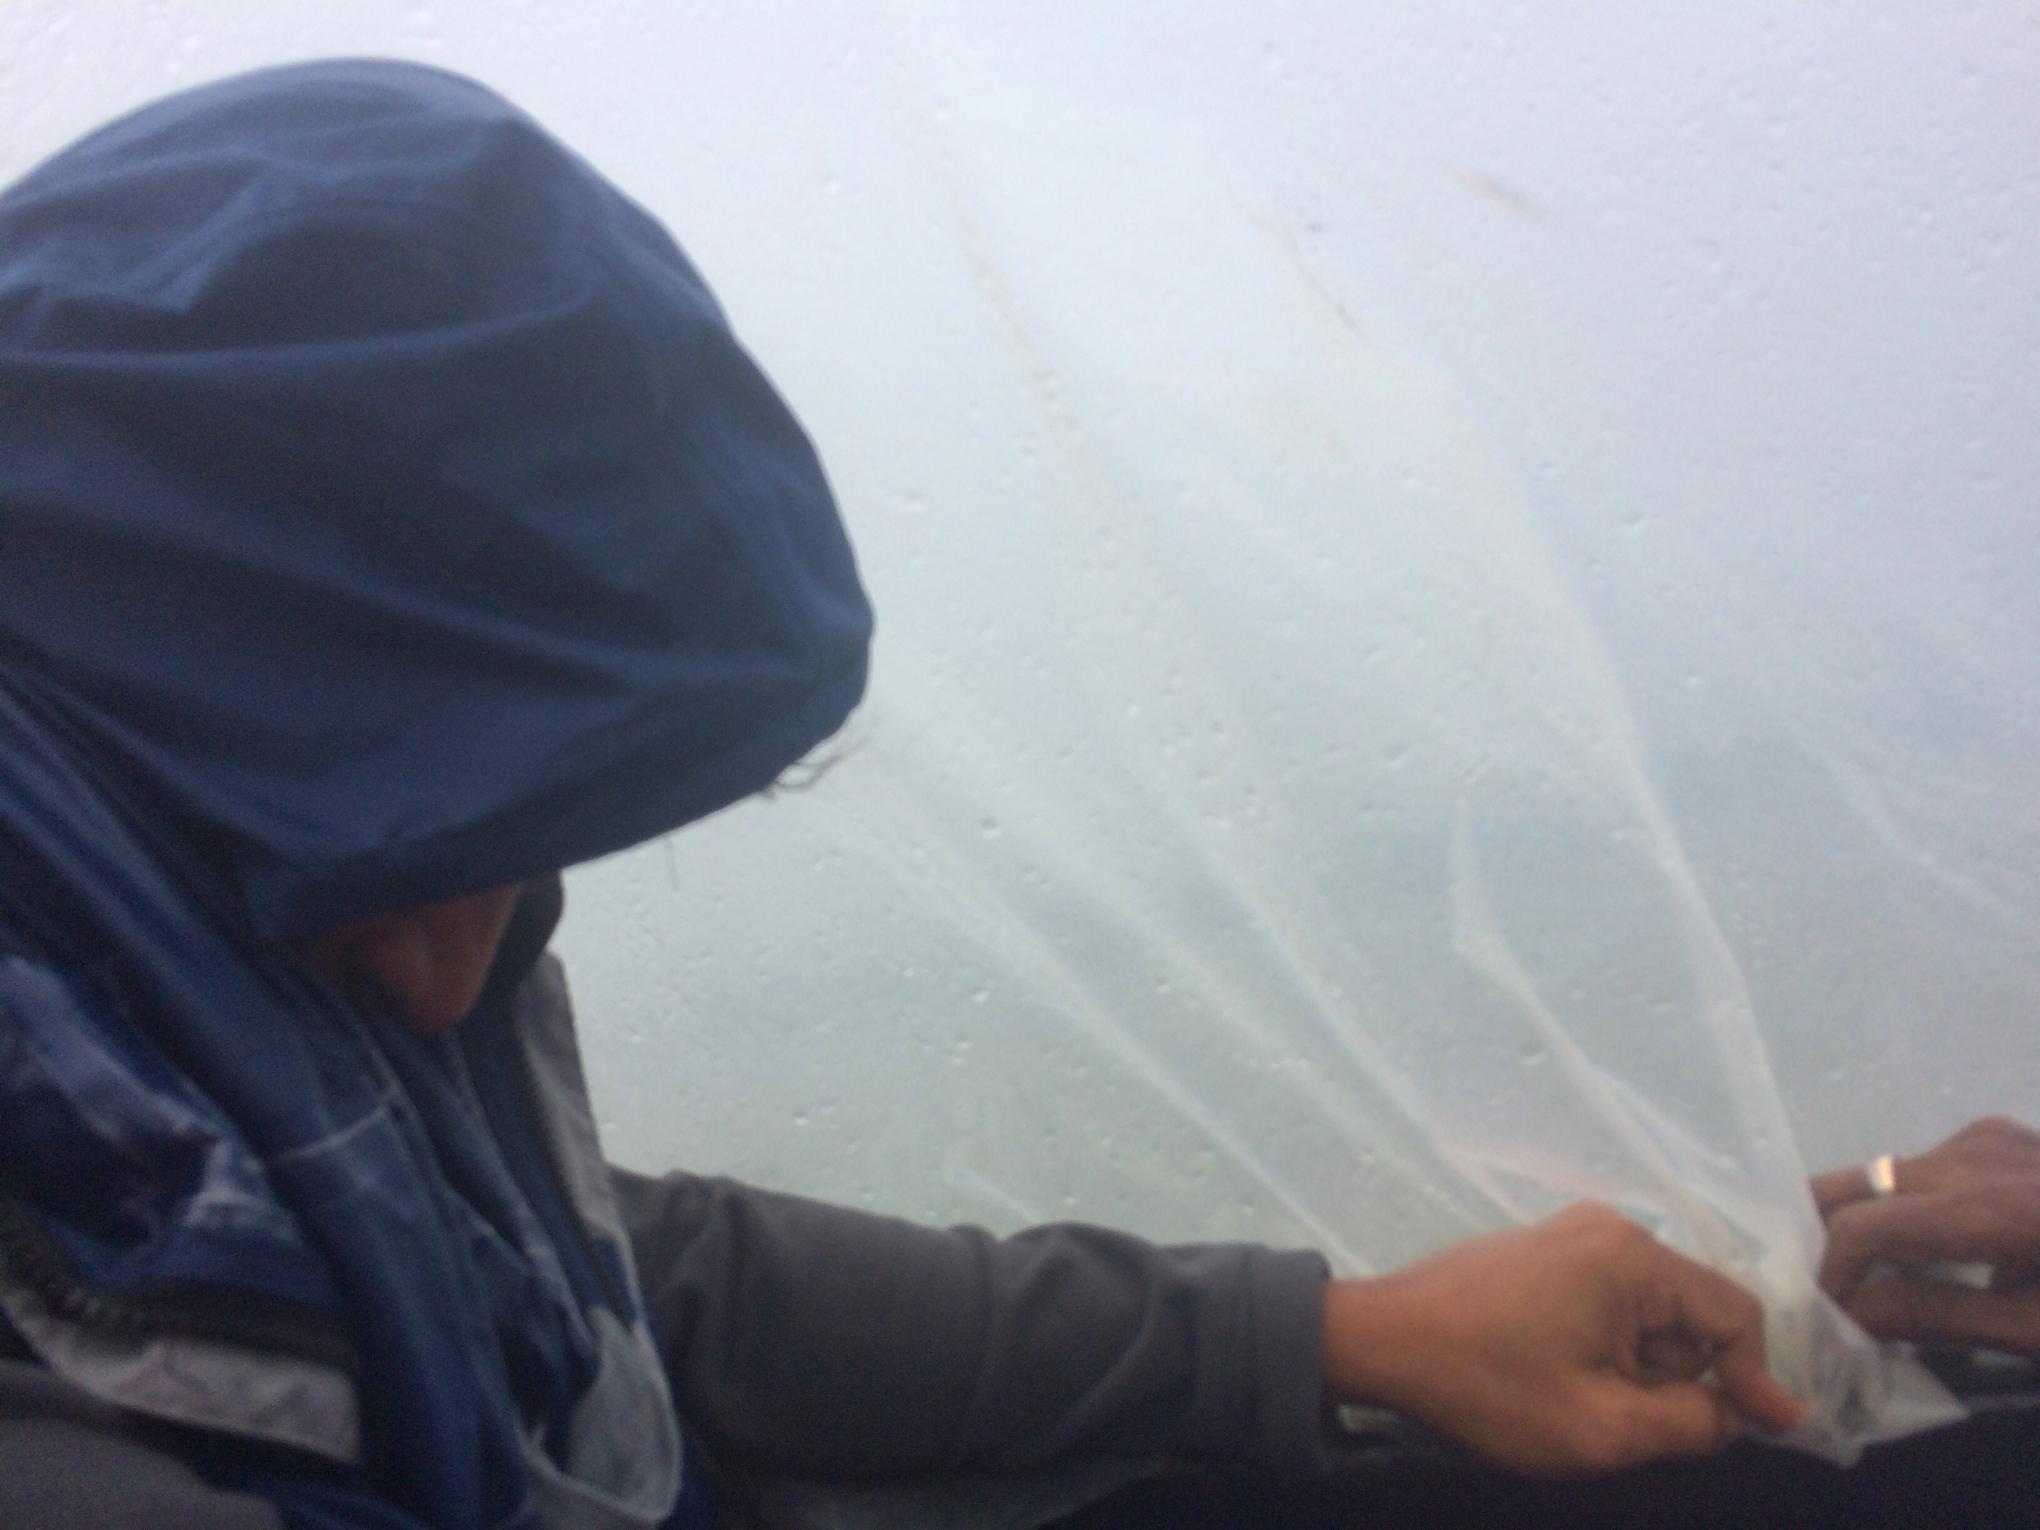 hidding like a refuge under a tarp